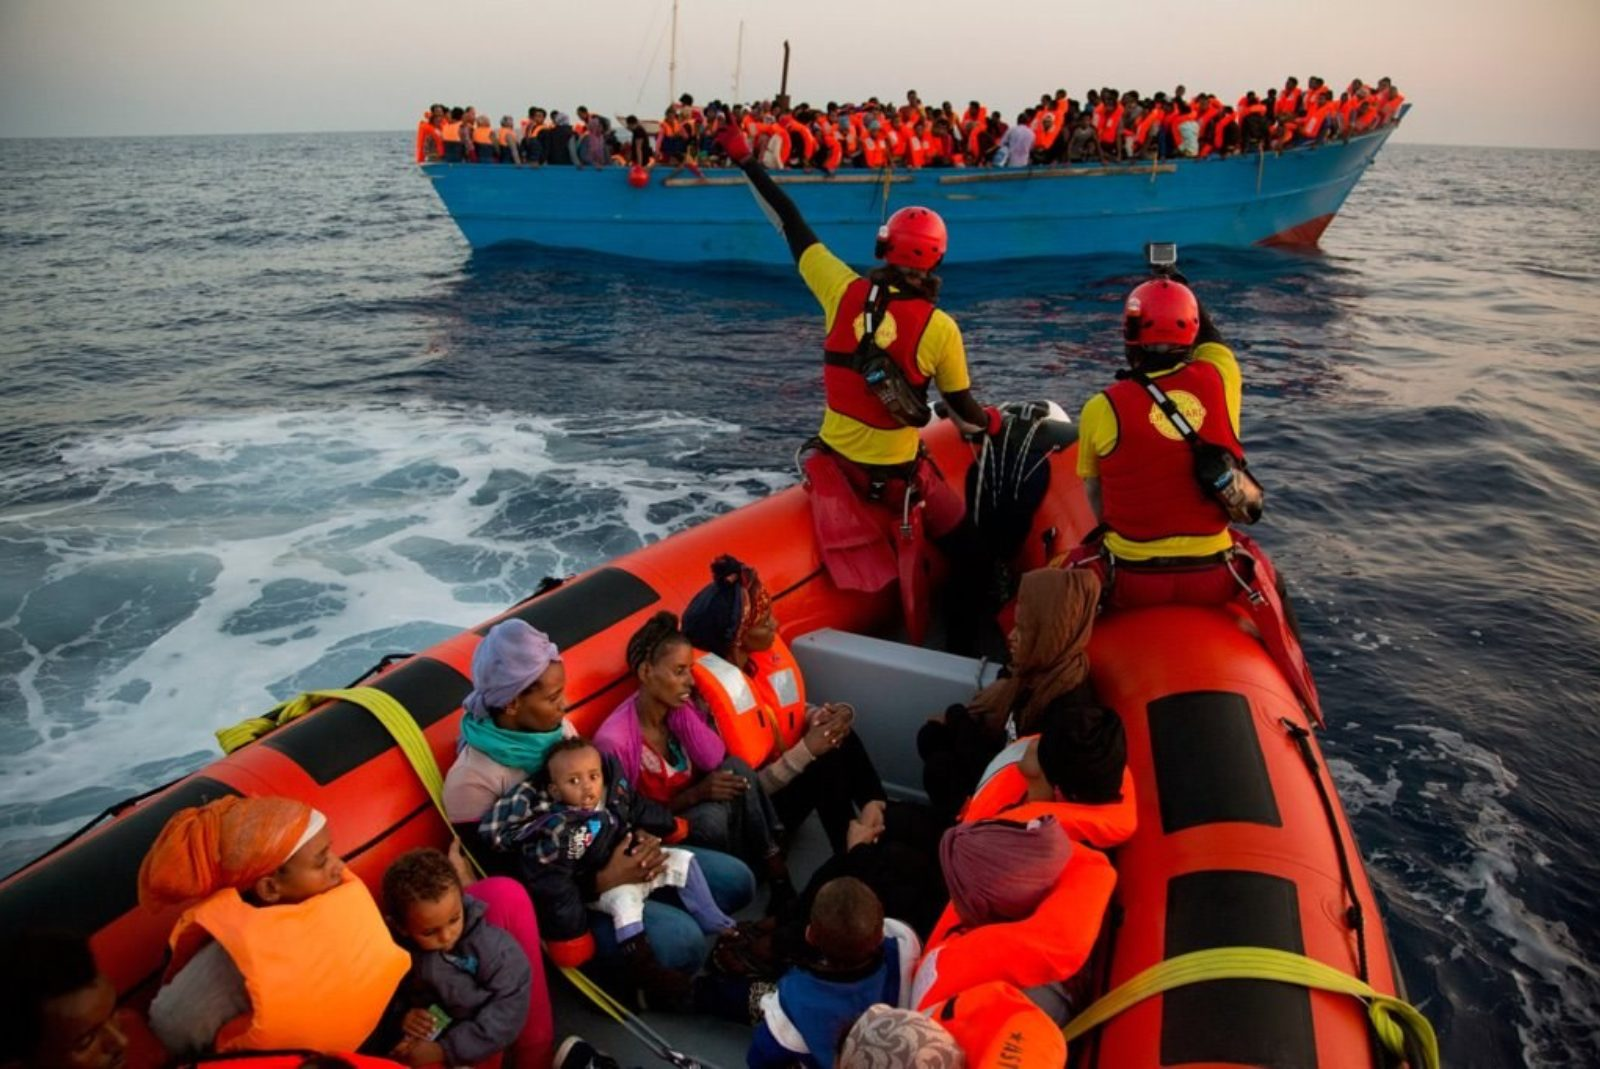 La telefonata che salva la vita dei migranti